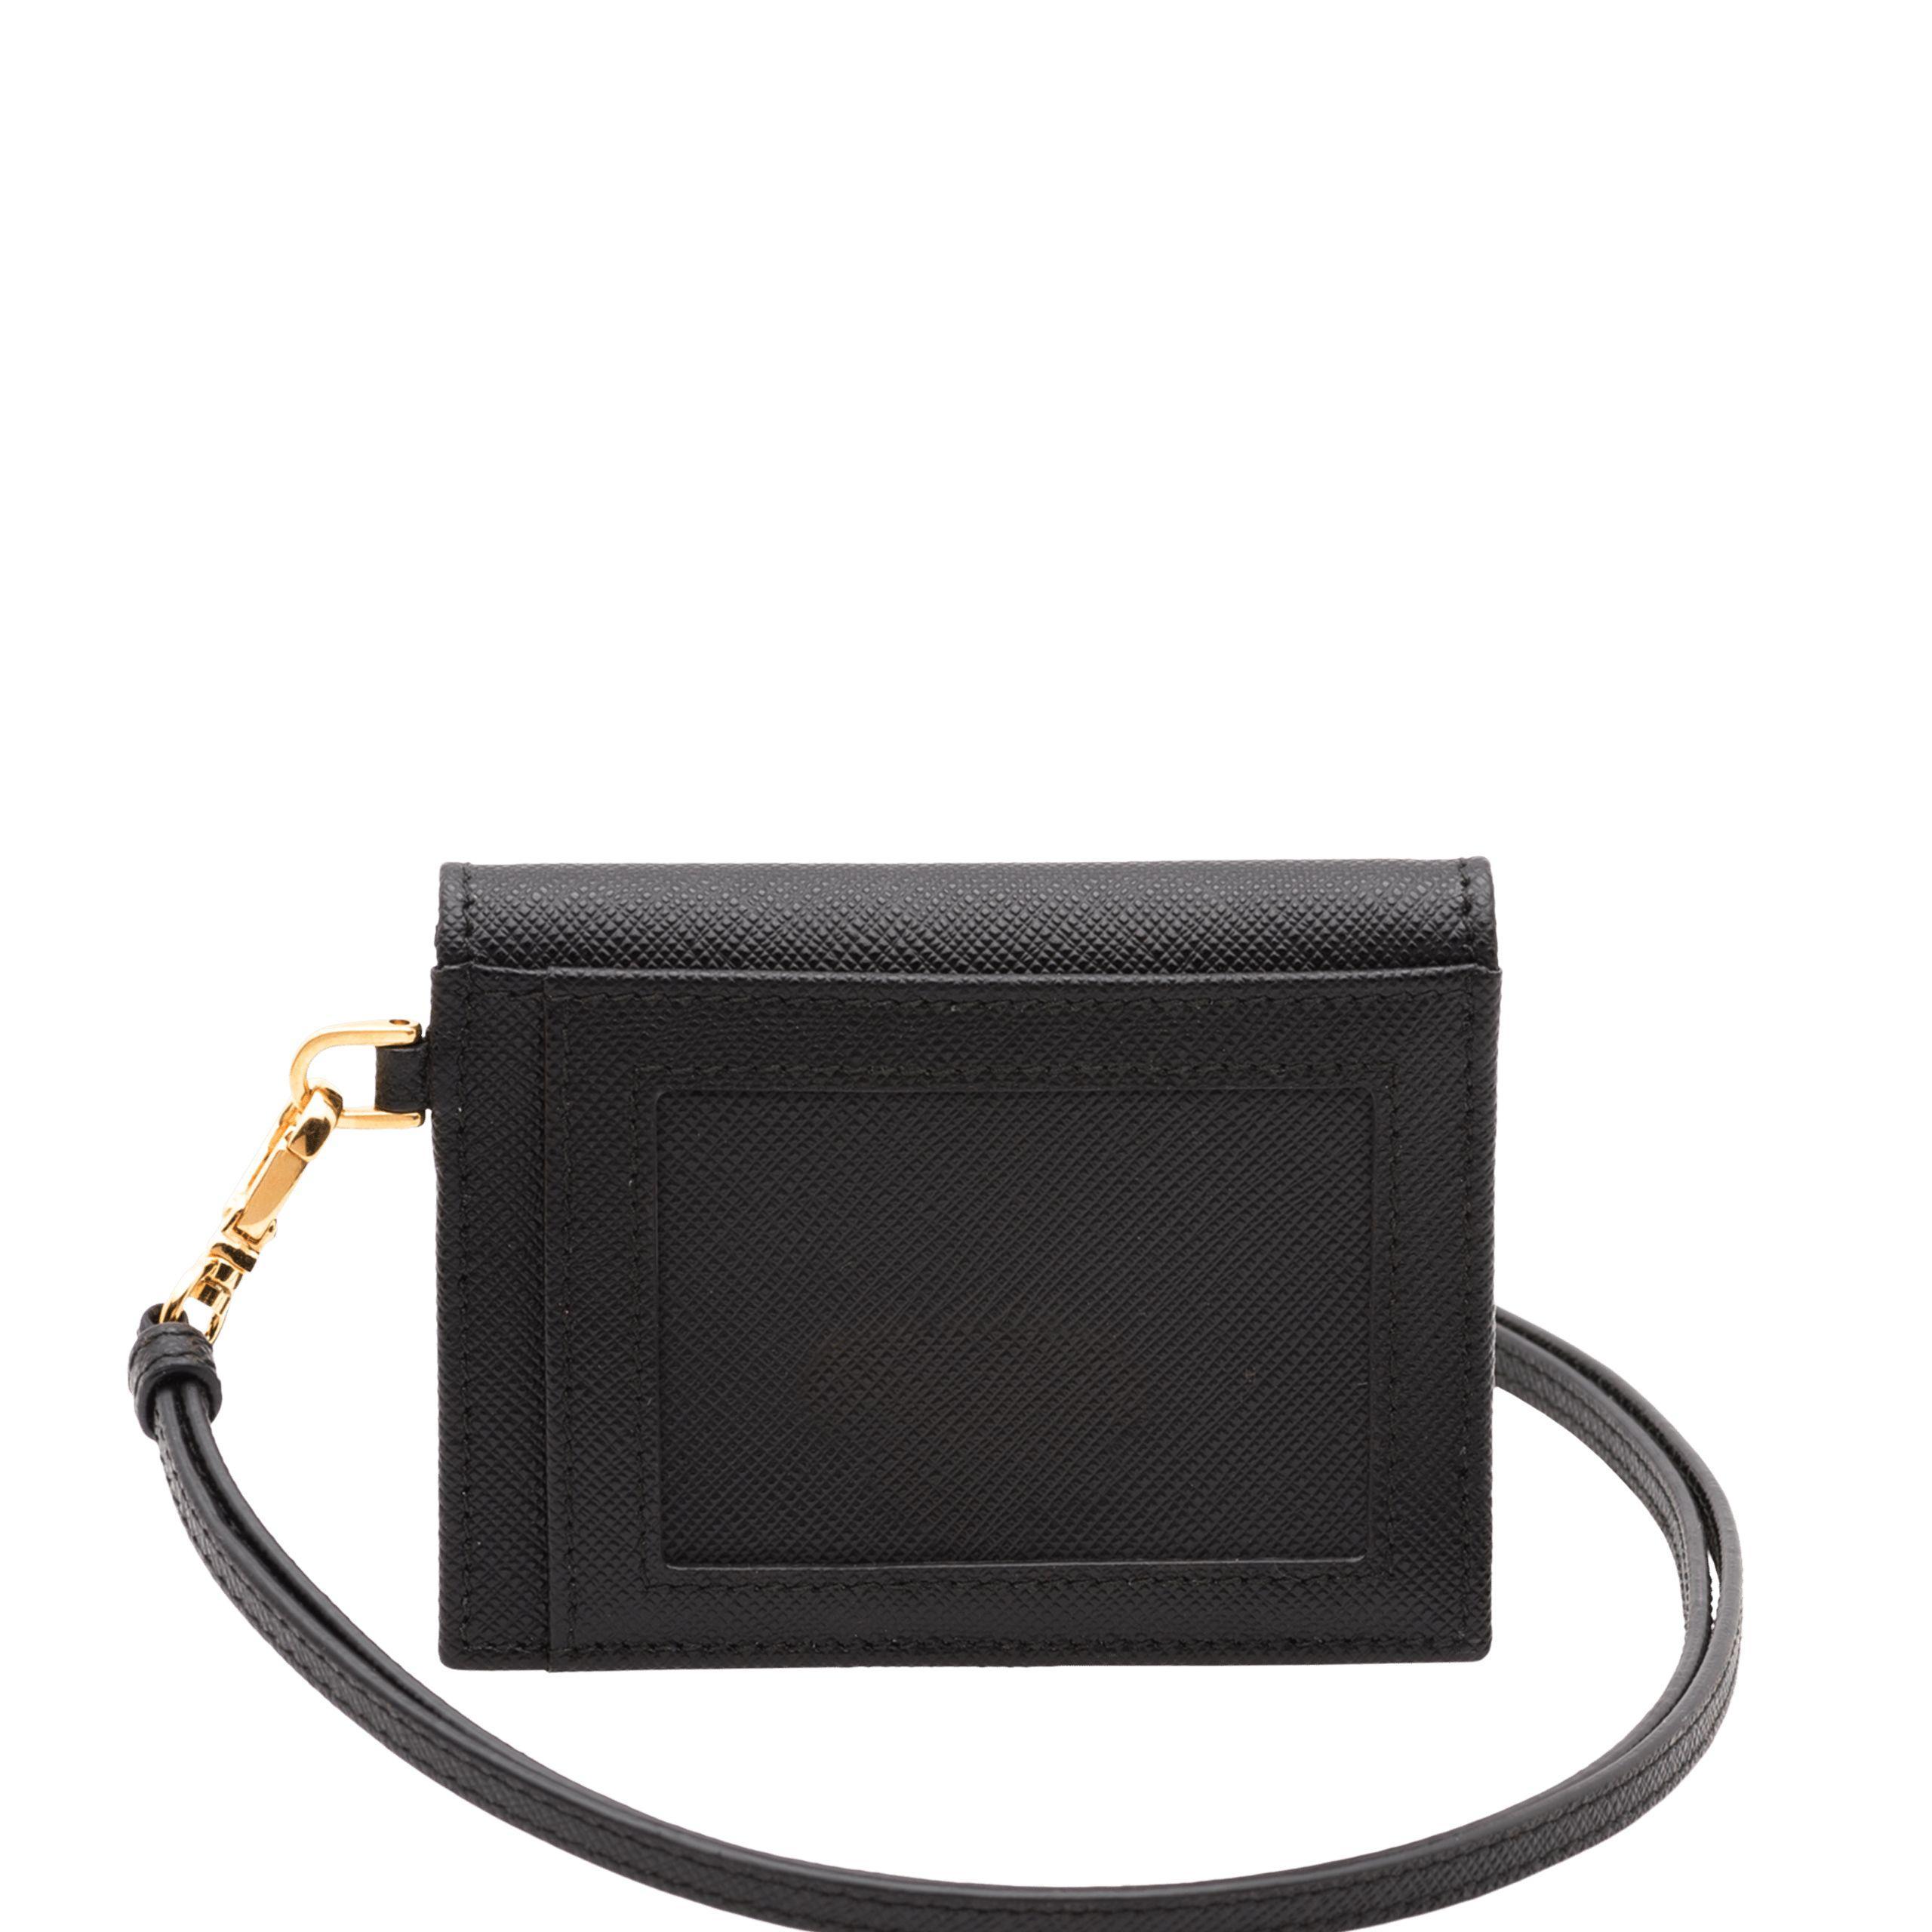 a9327525d78938 Prada - Black Leather Badge Holder - Lyst. View fullscreen